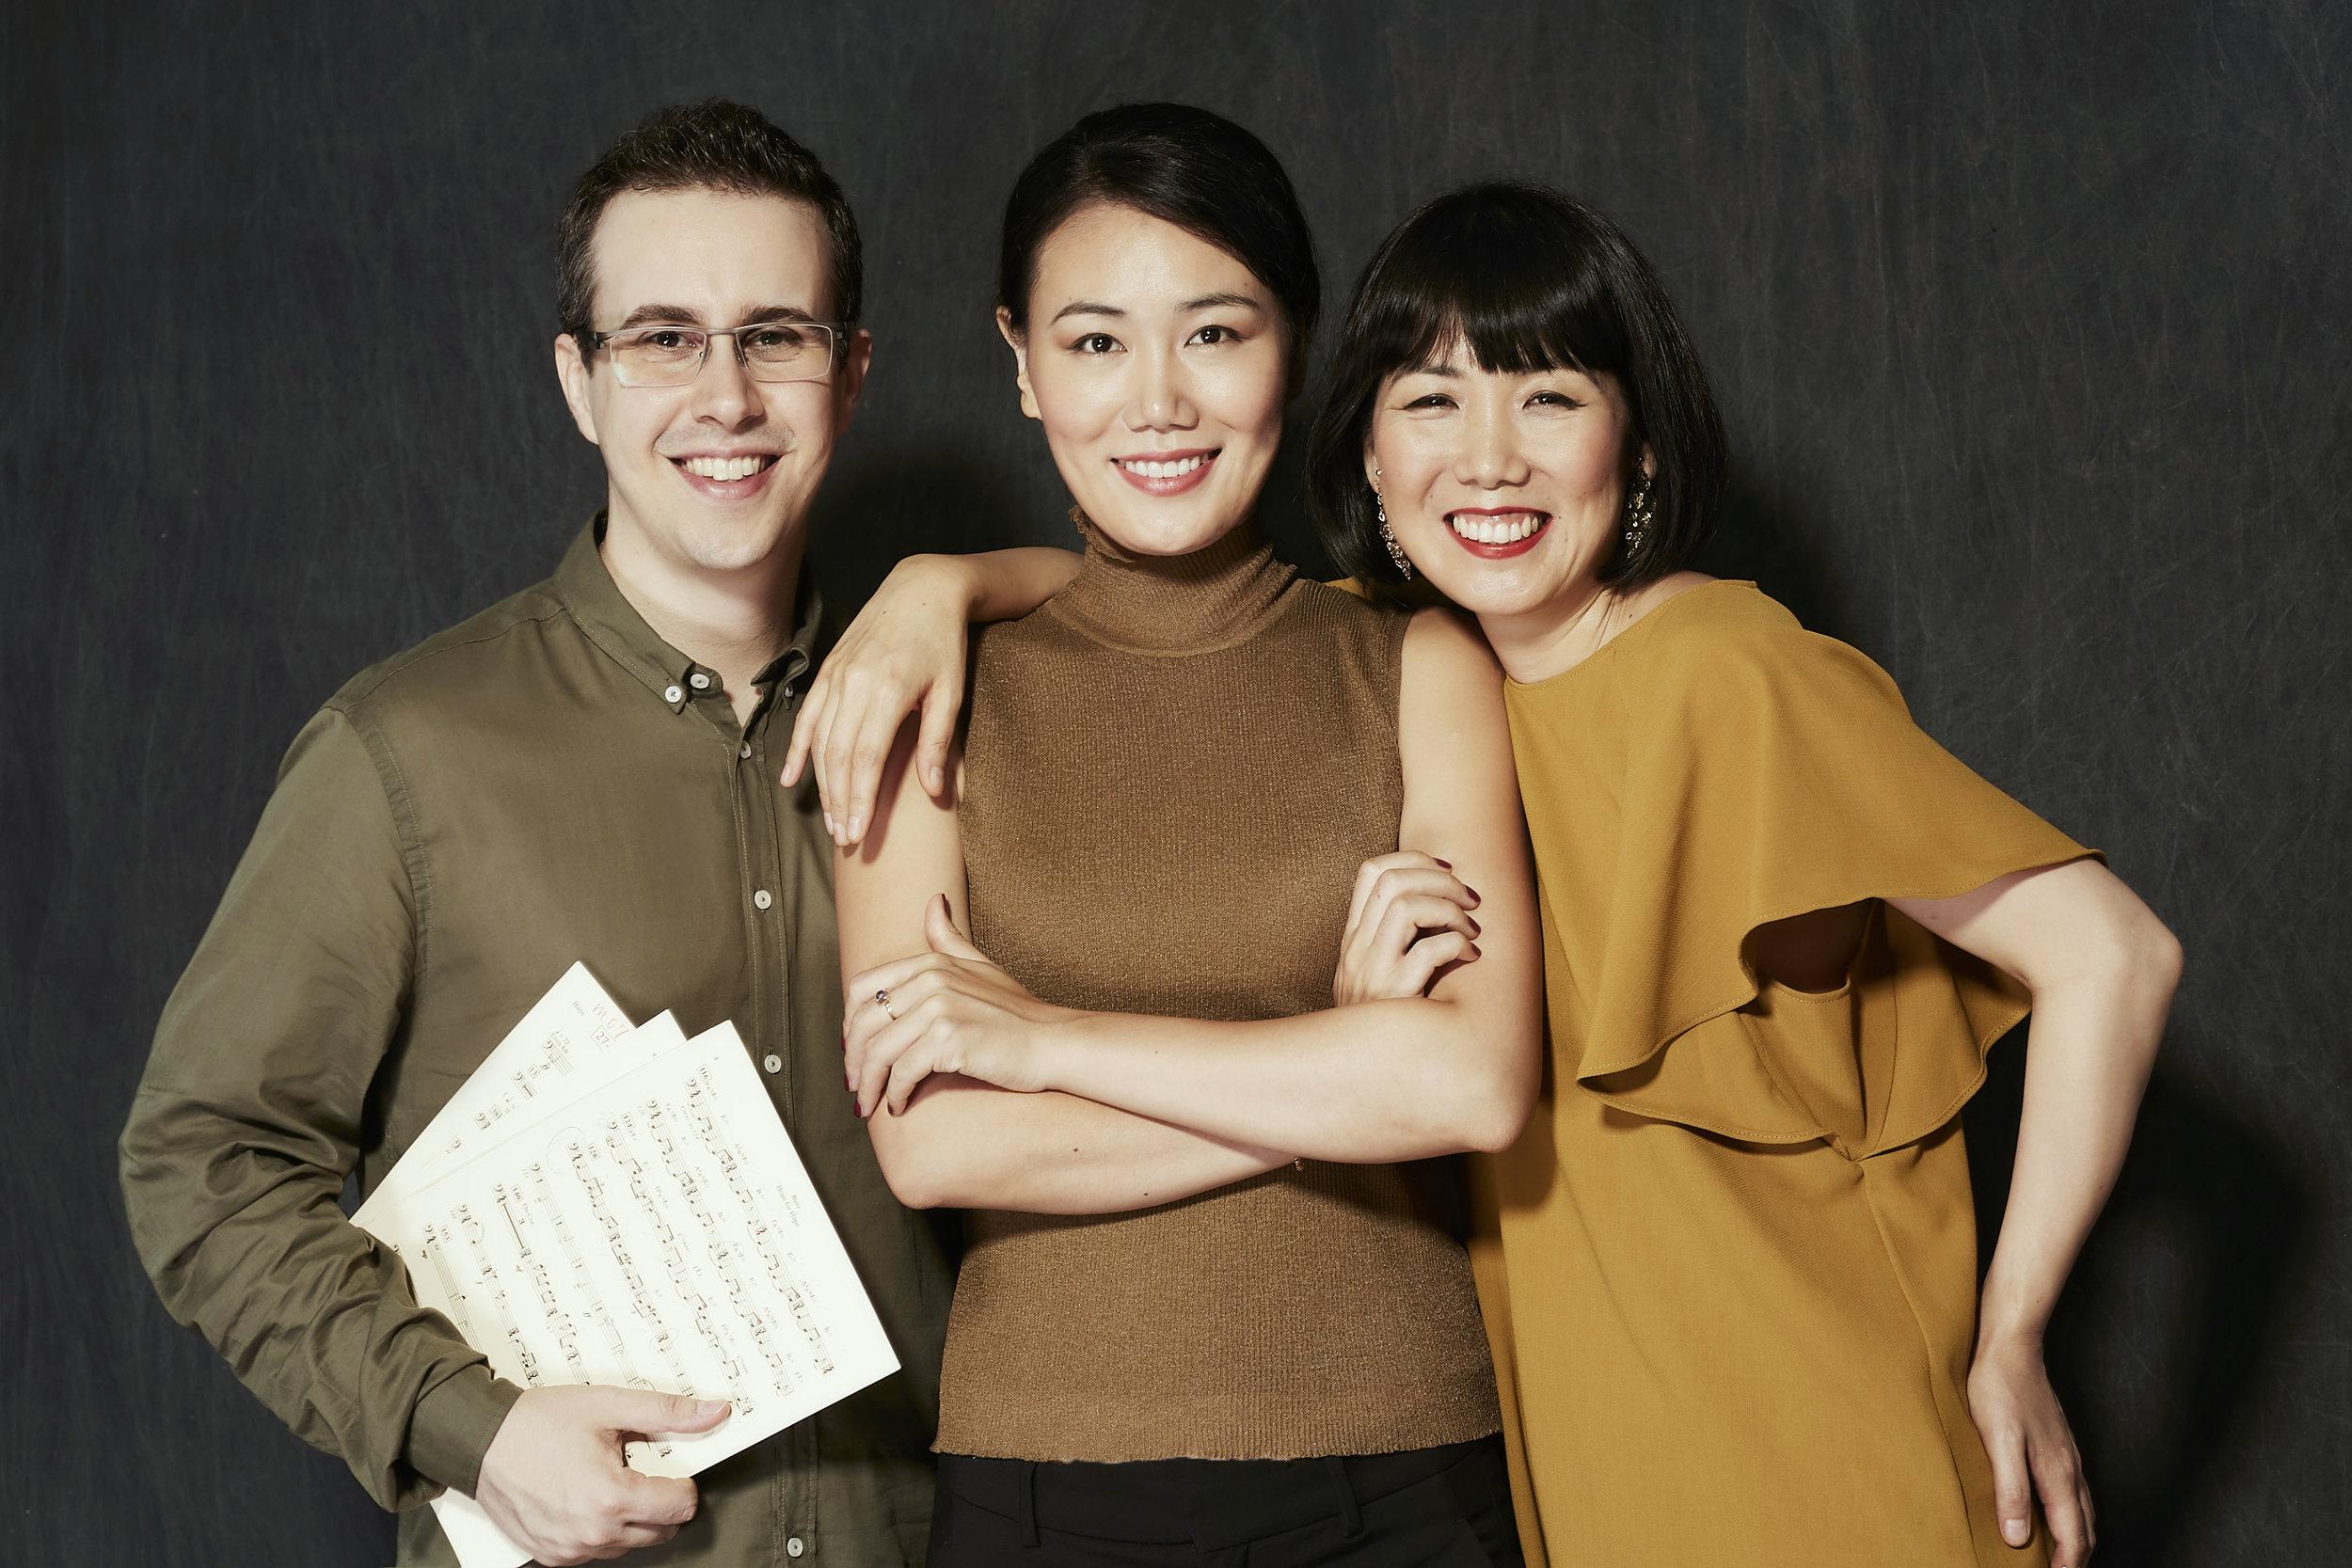 Rafael Piccolotto de Lima (Brazil), Jihye Lee (South Korea) and Migiwa Miyajima (Japan)